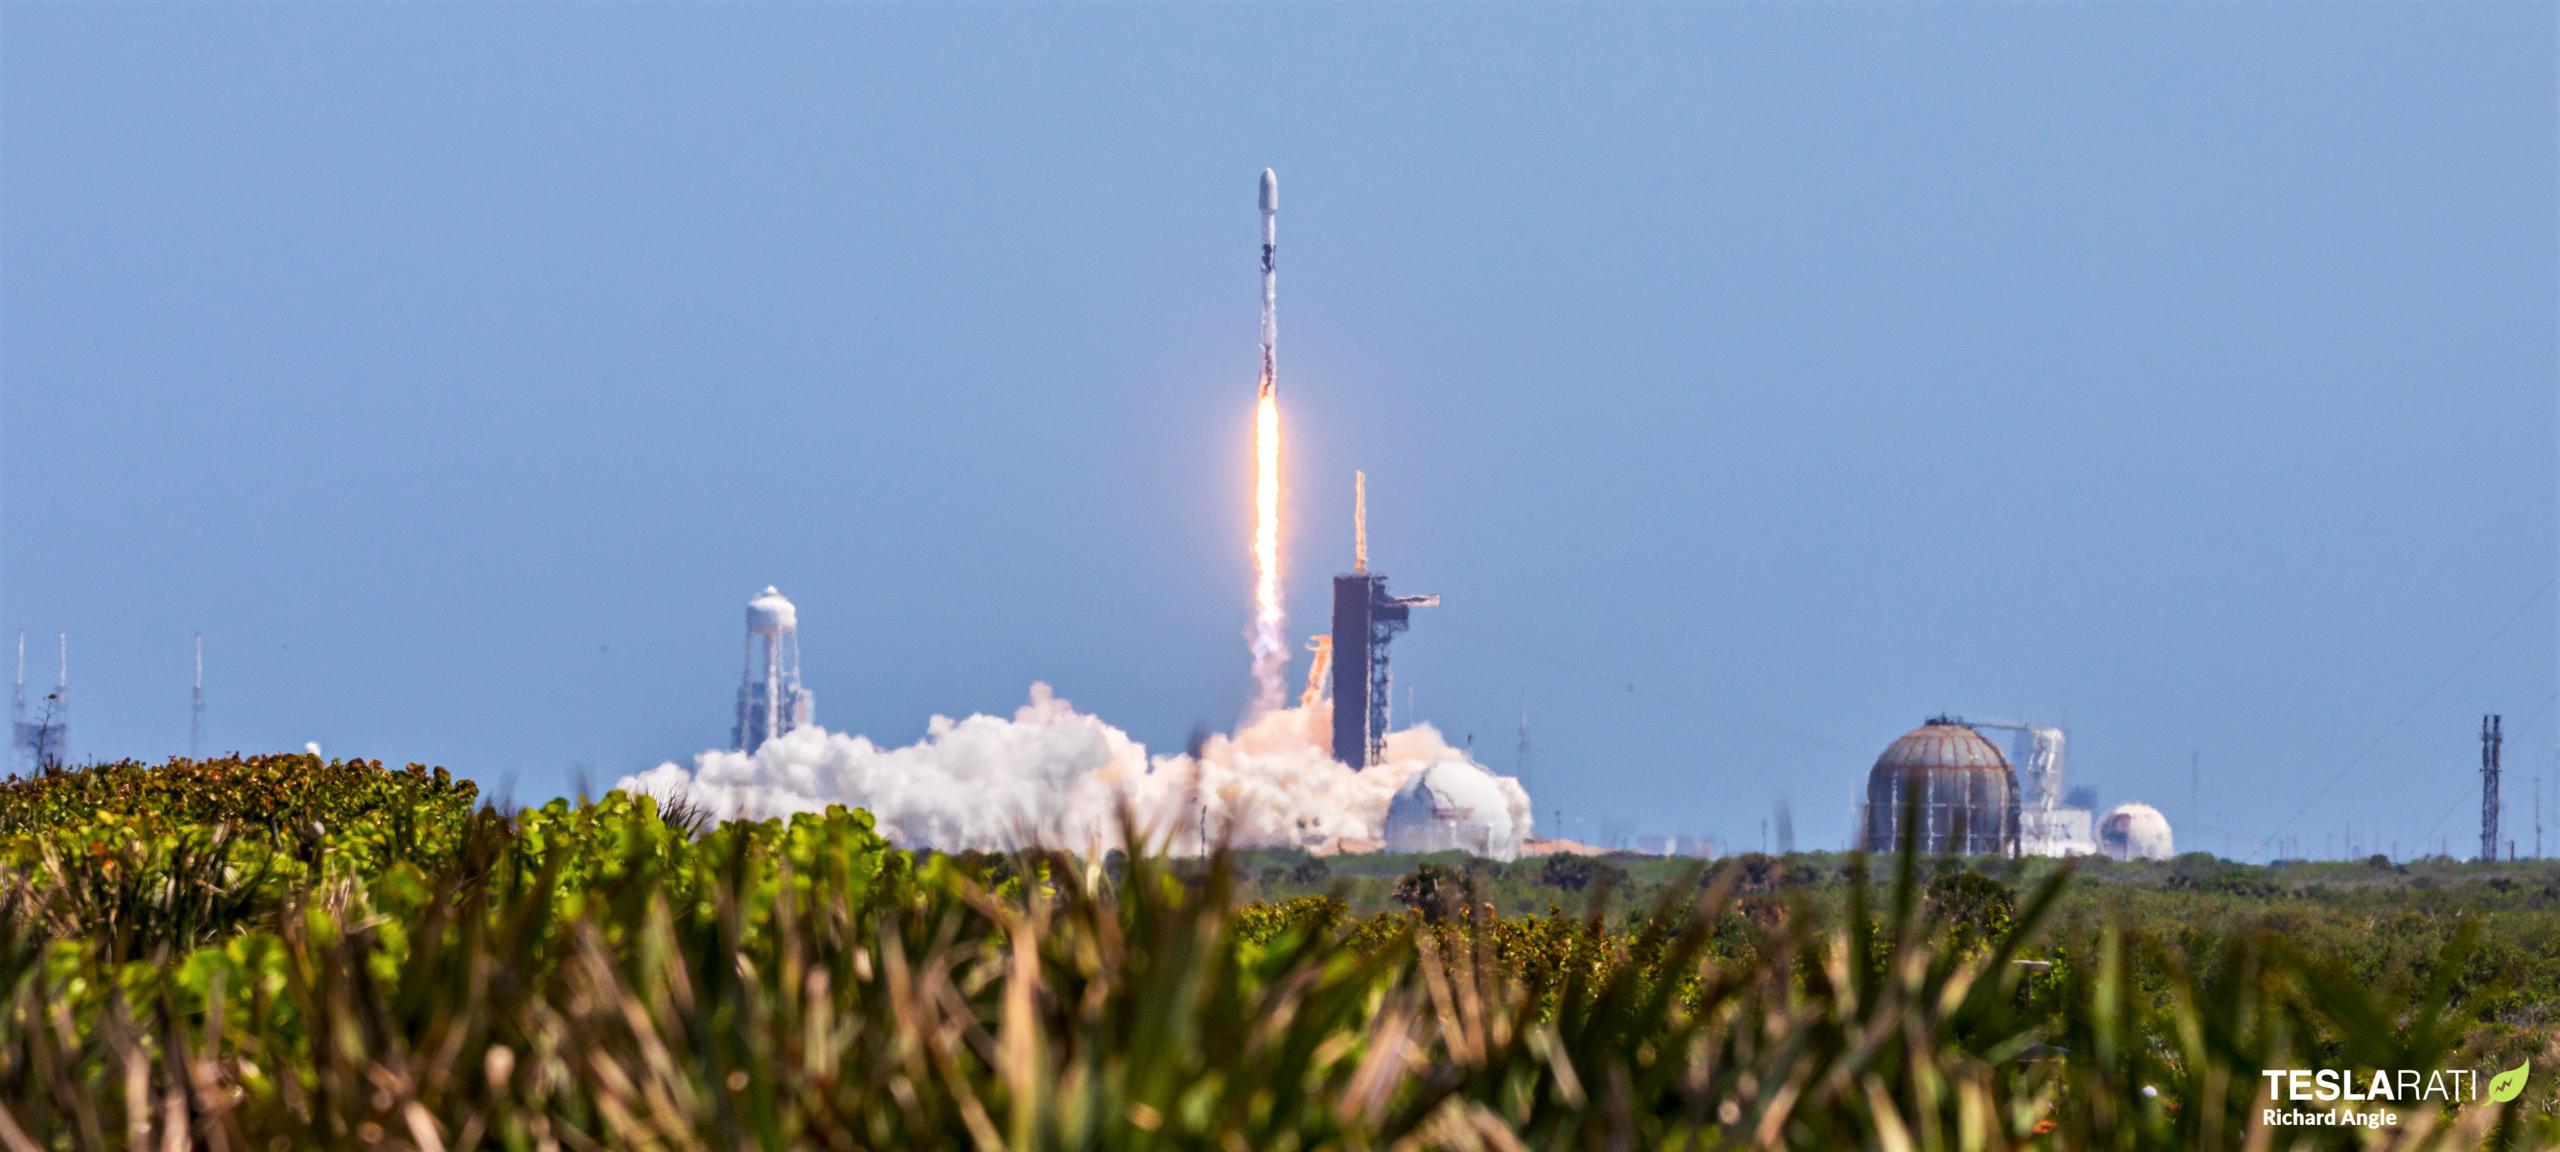 Starlink-25 Falcon 9 B1049 LC-39A 050421 (Richard Angle) 1 (c)